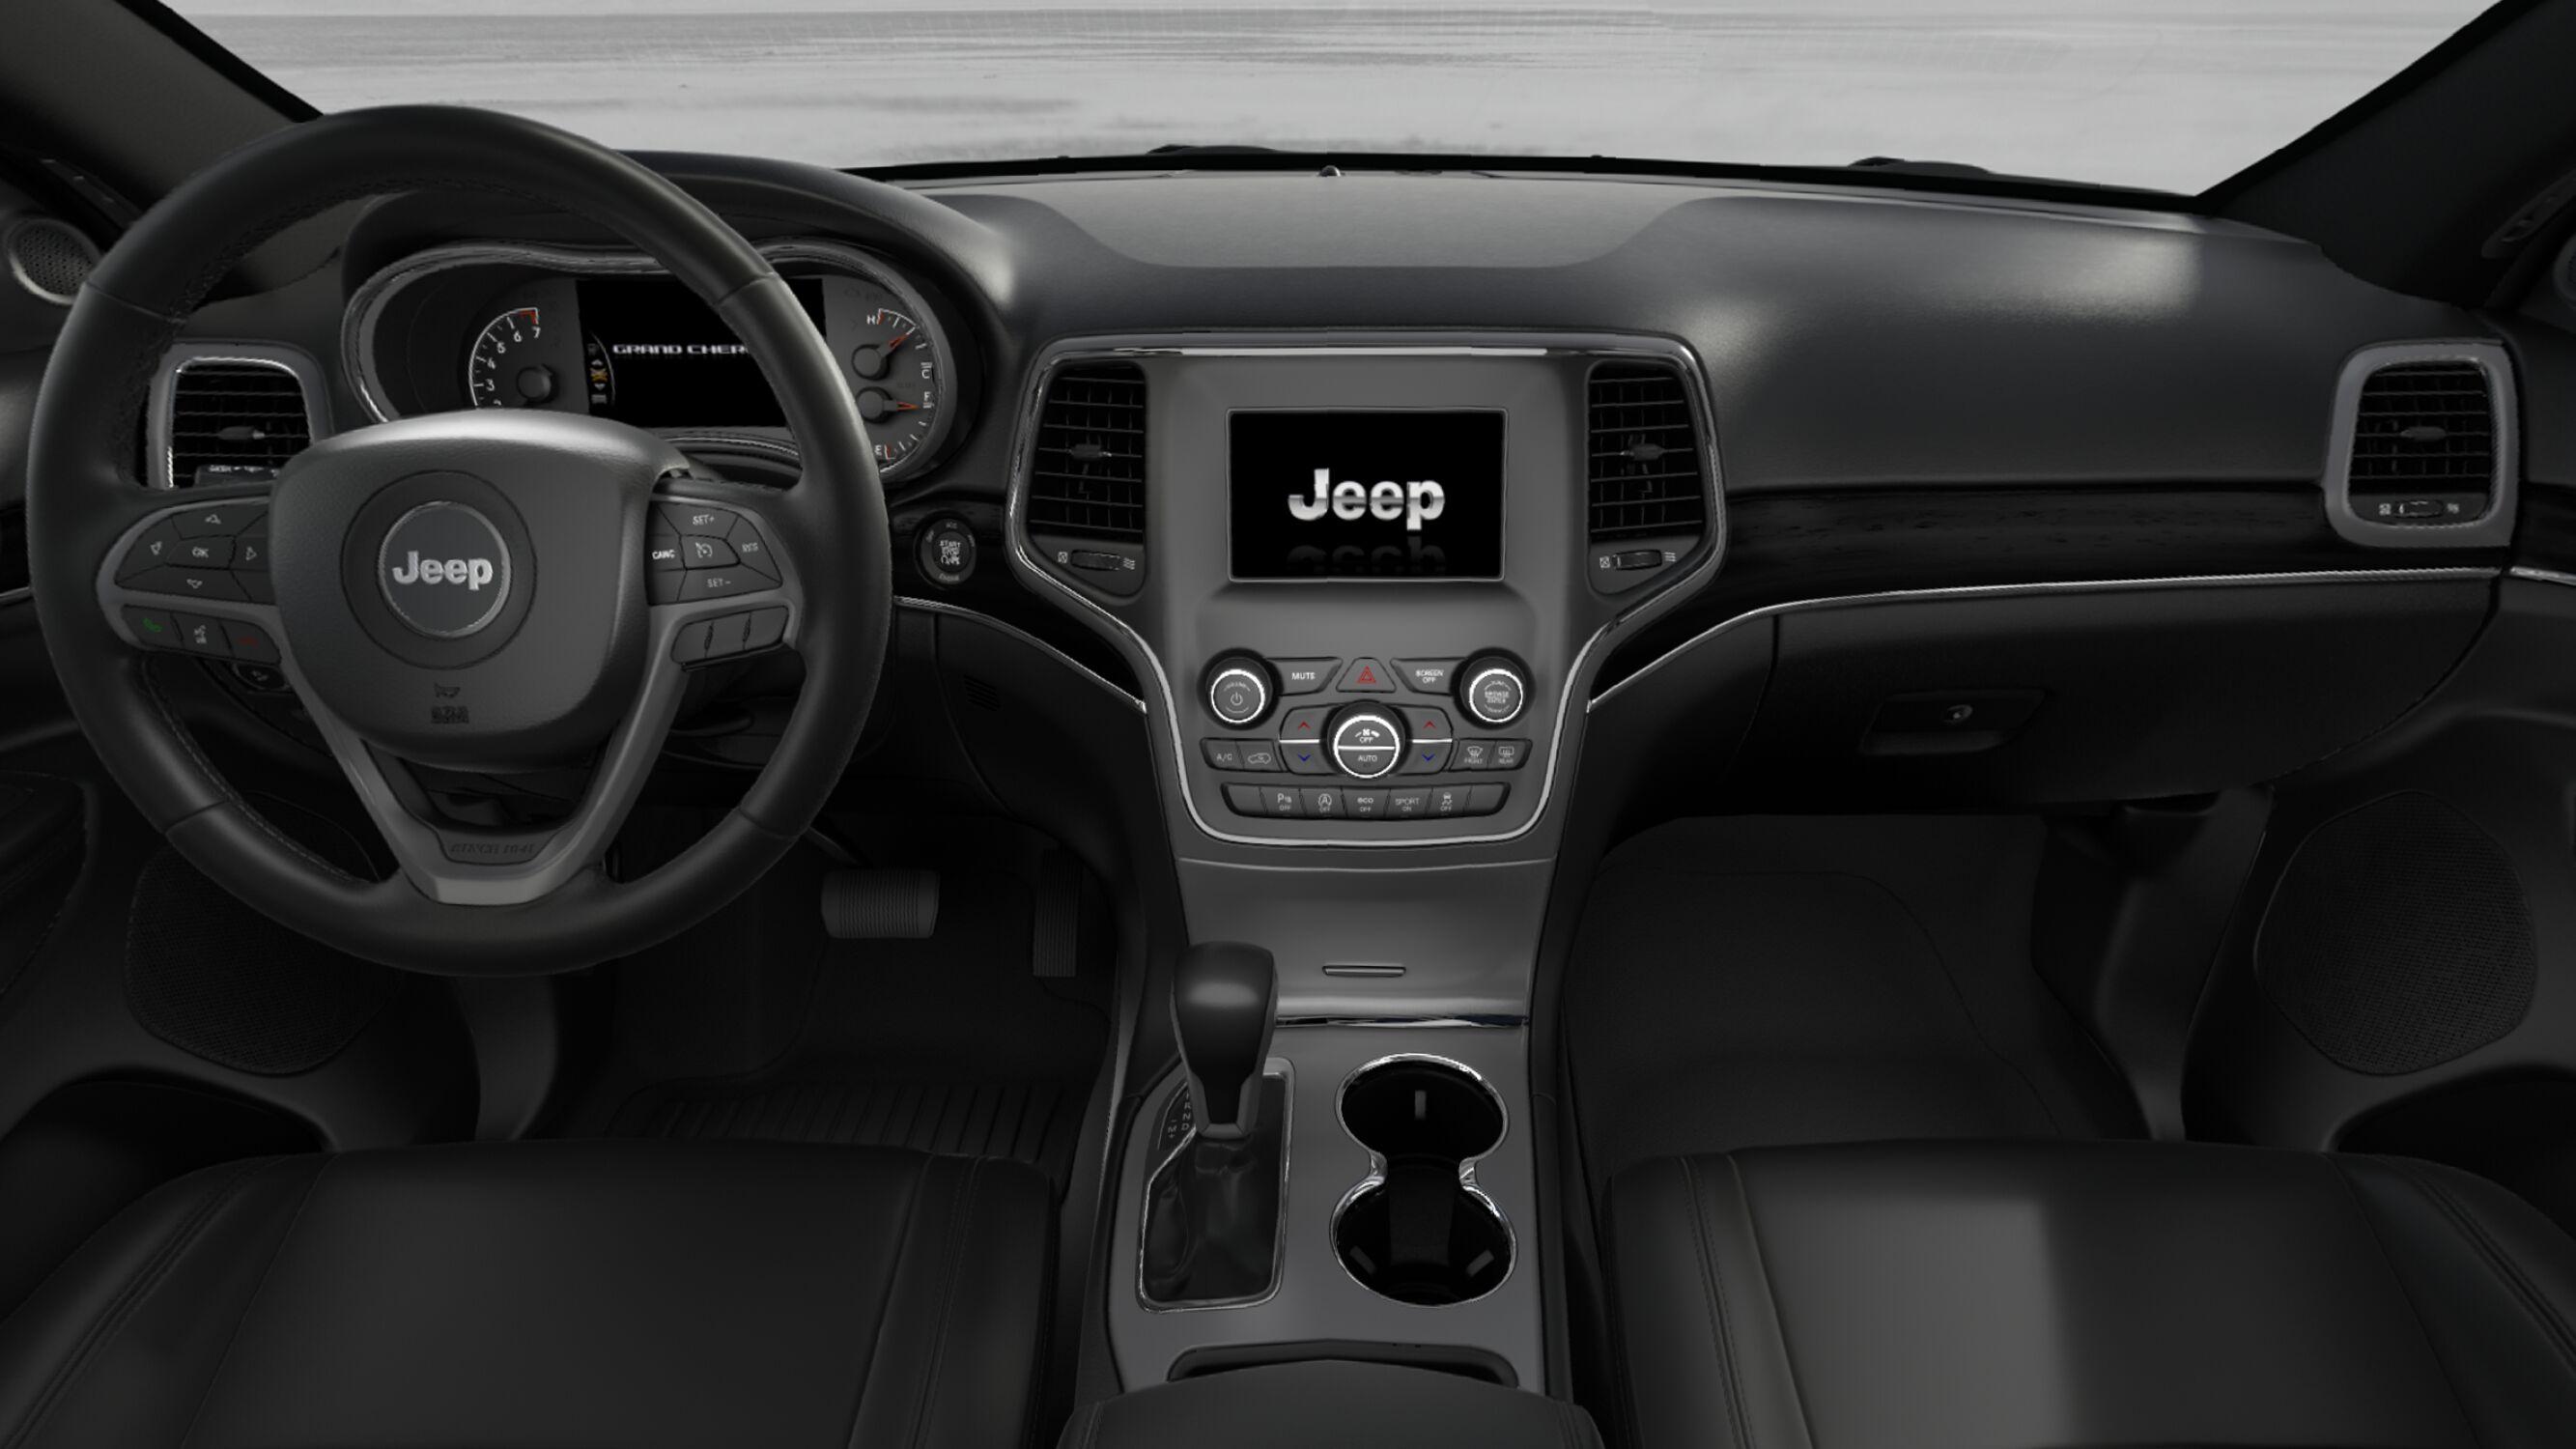 Jeep 2017 Interior